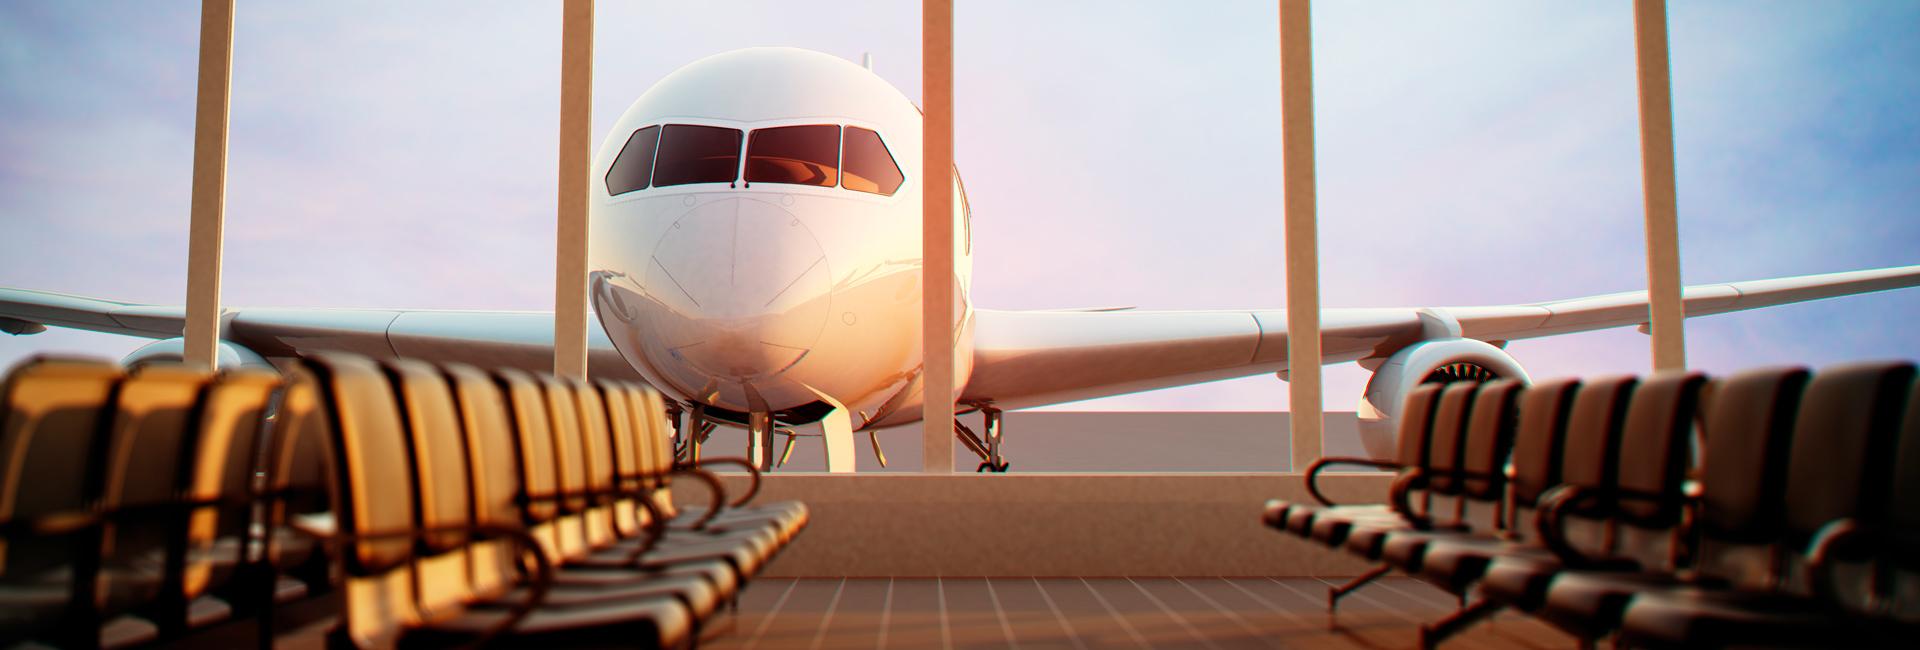 Puerto vallarta airport expansion